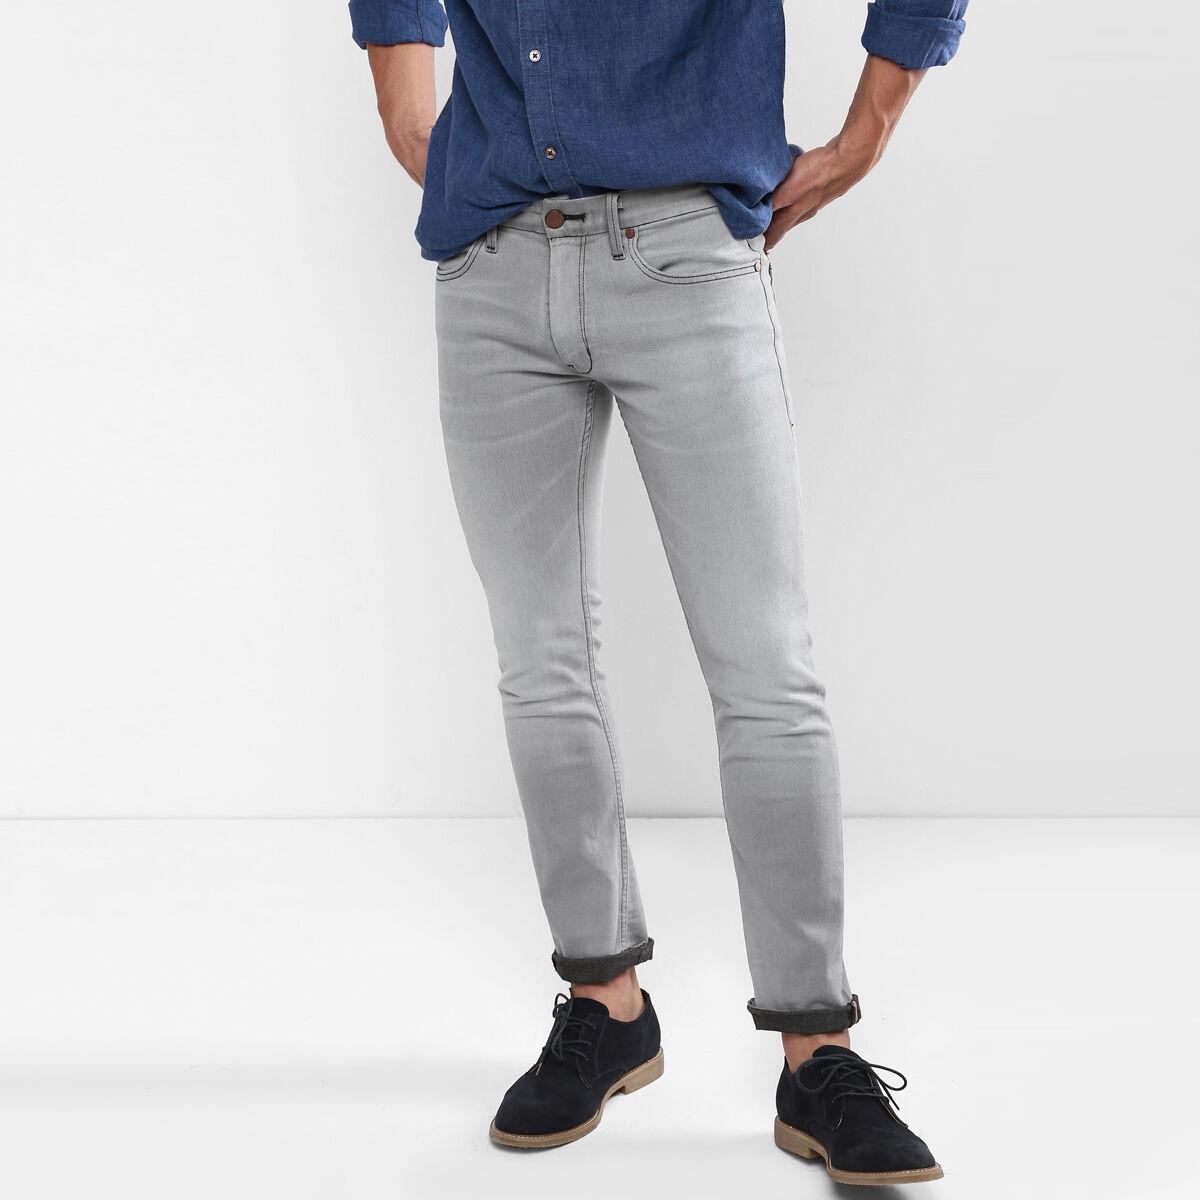 MenIndia Jeans Levi's® Levi's® Jeans For Jeans For MenIndia Levi's® For qjLRc543A